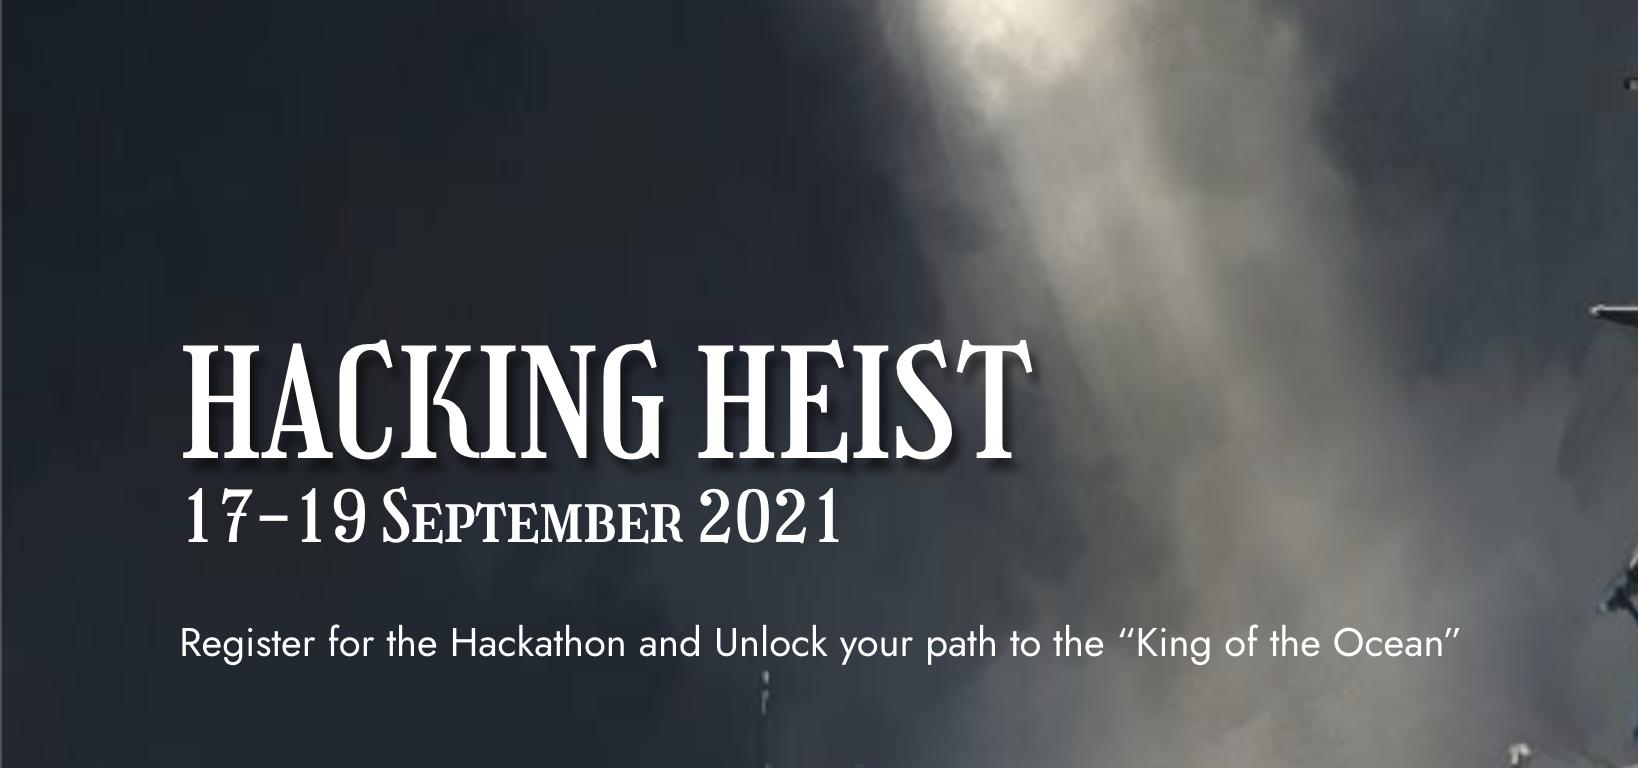 HACKING HEIST